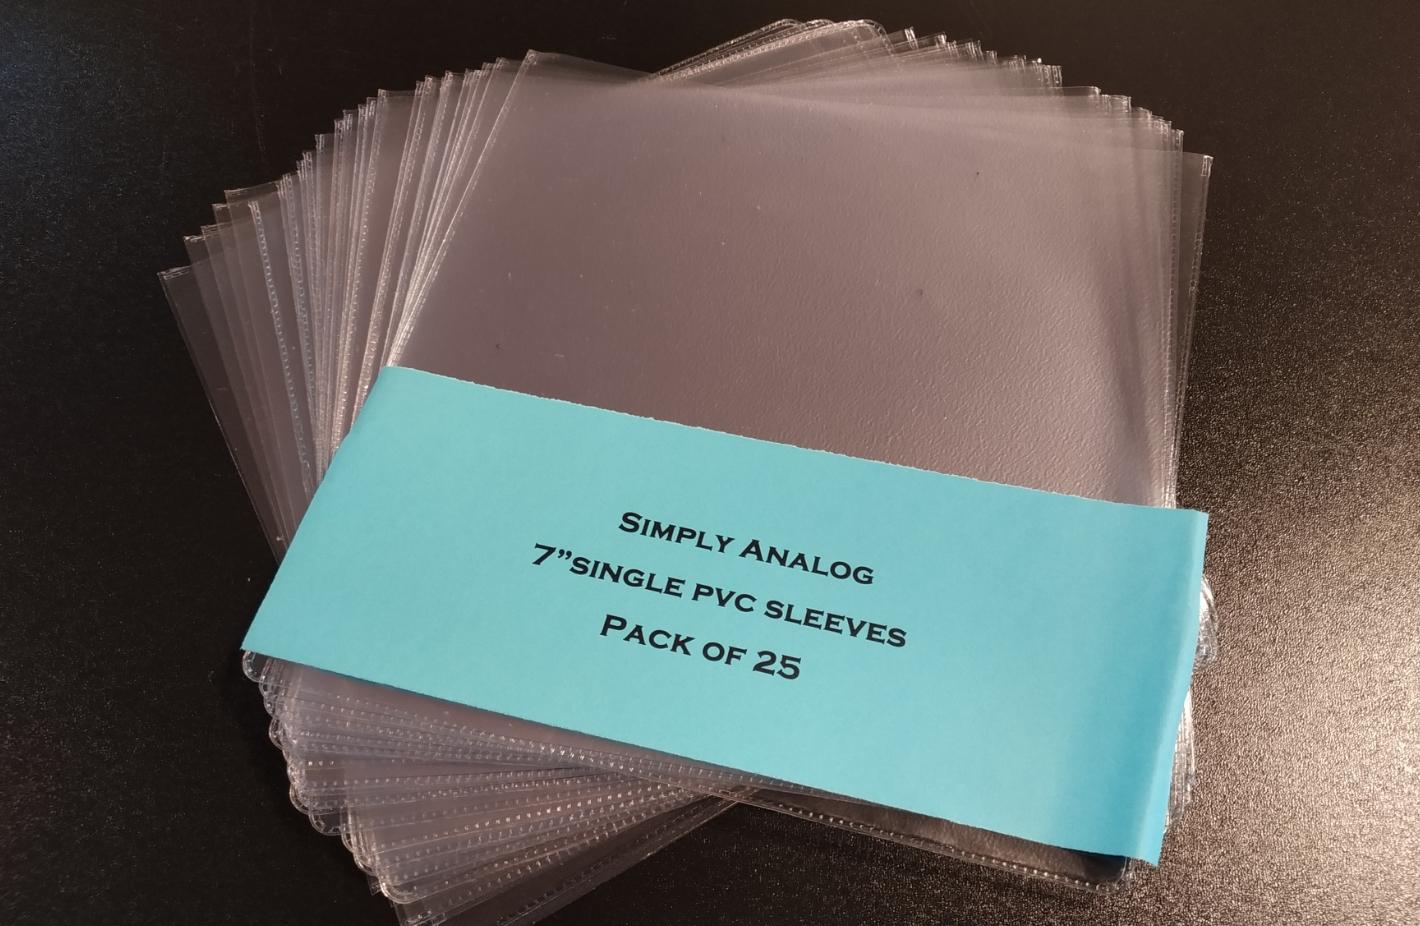 "Simply Analog - 7"" SINGLE PVC SLEEVES"